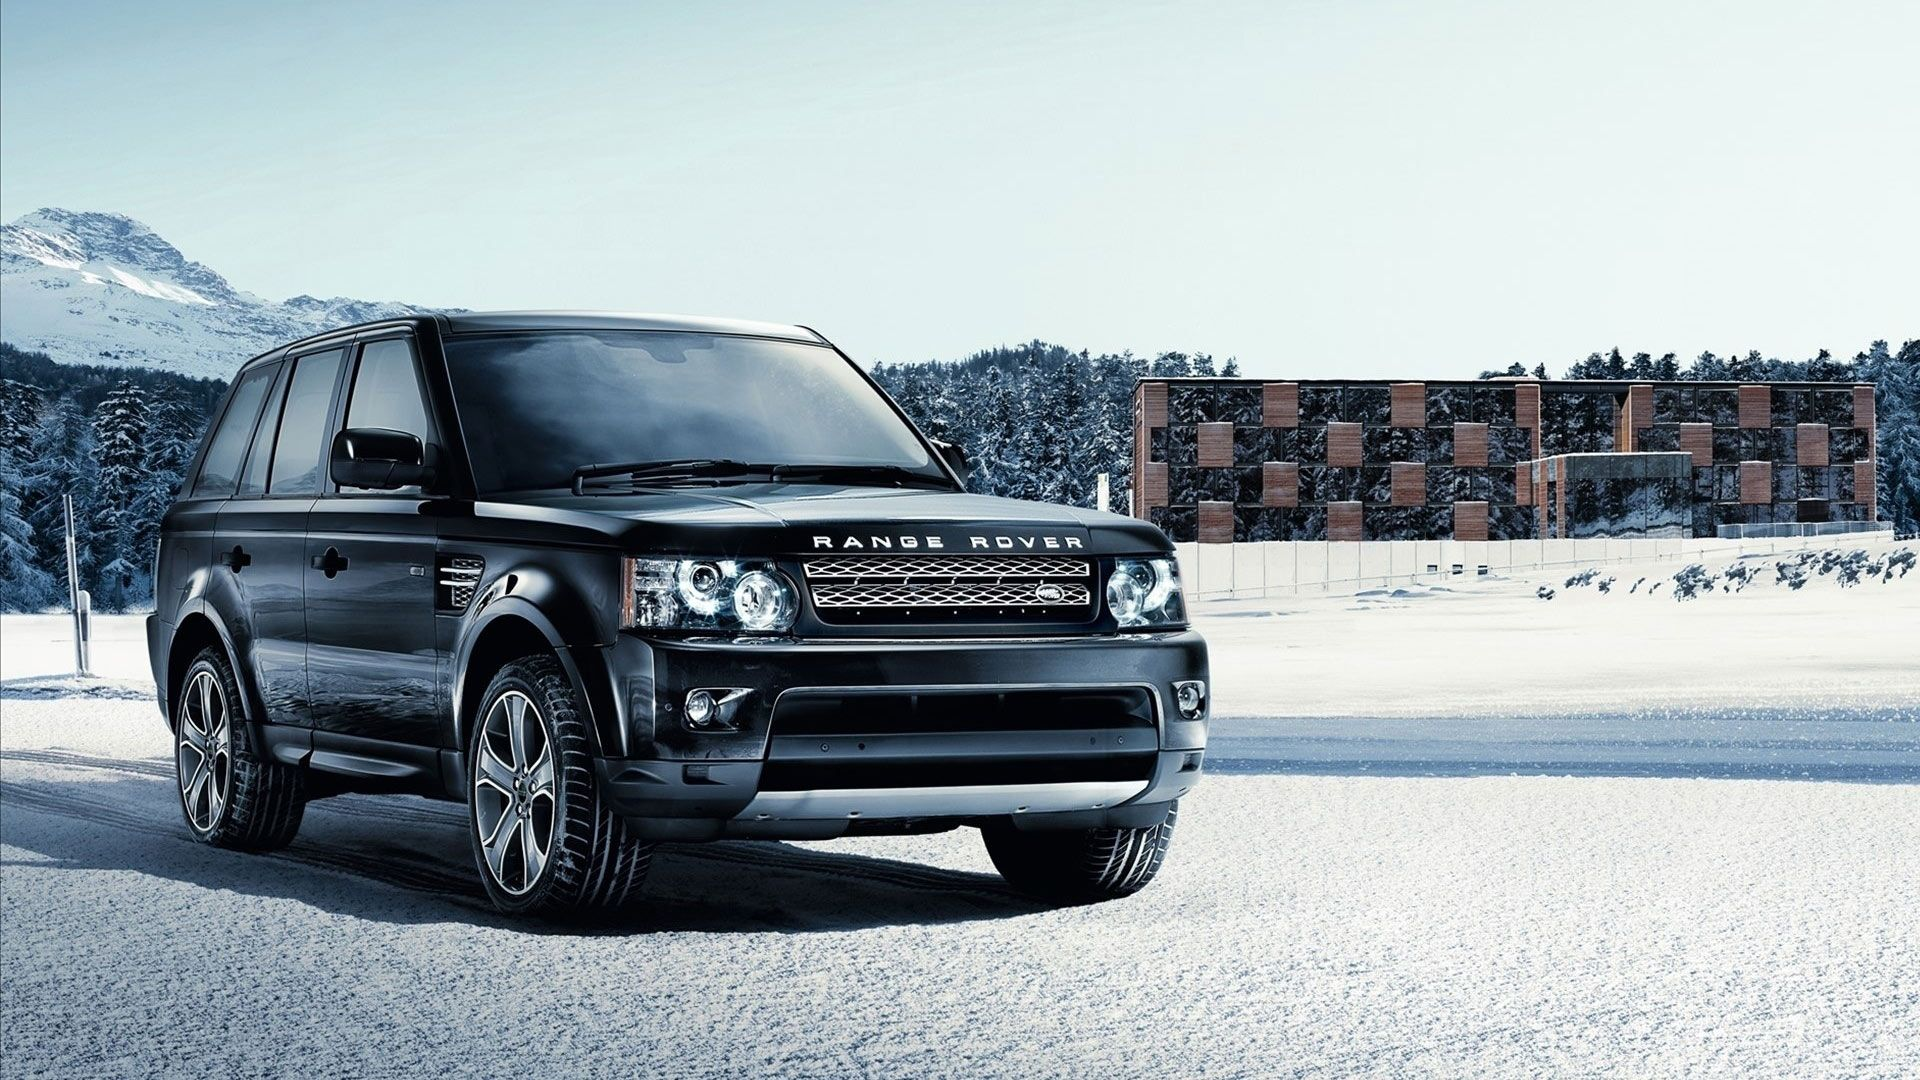 Range Rover wallpaper free